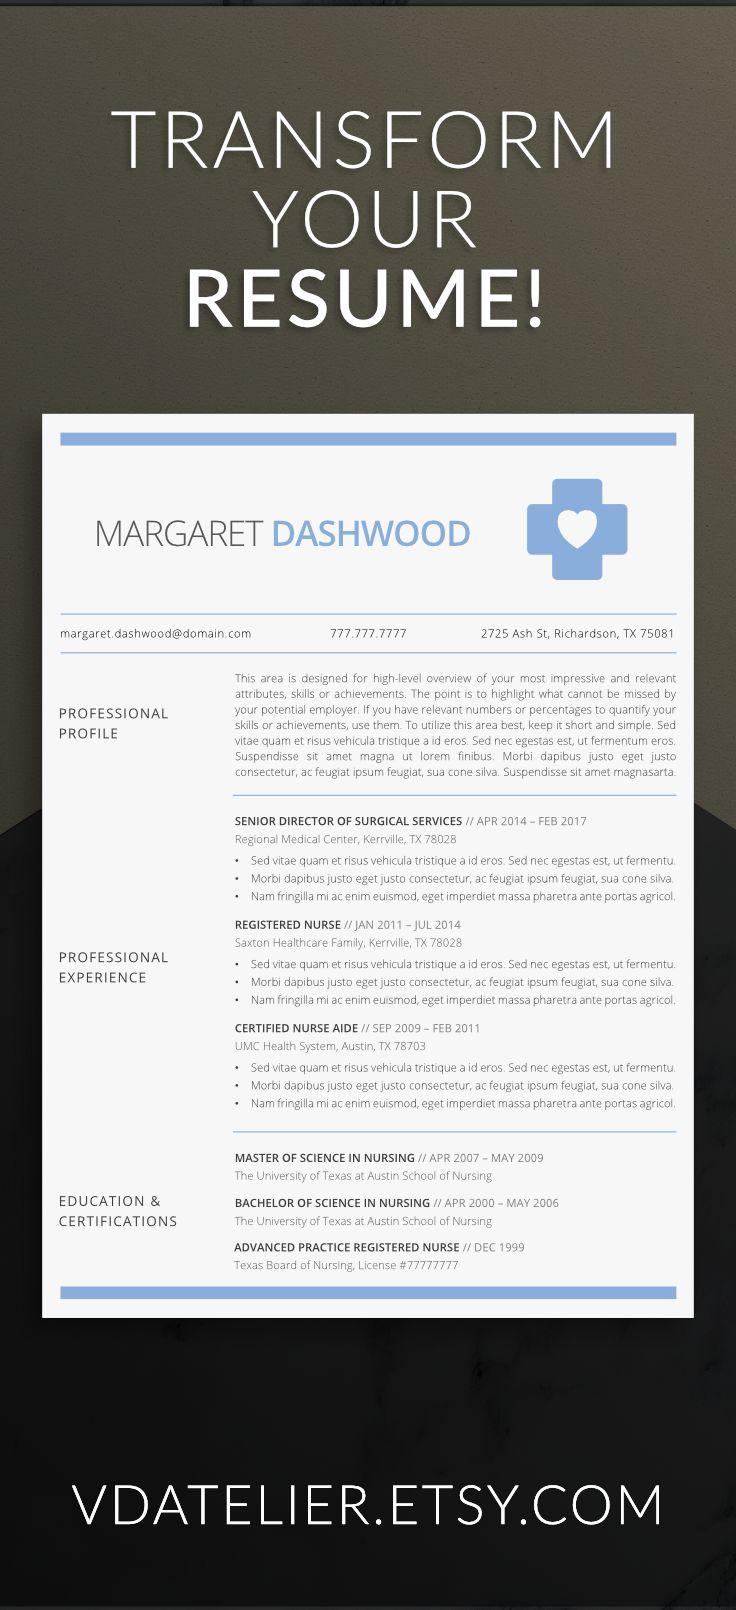 Nurse resume template for modern professionals. Suitable as medical resume for nurses, CNA, EMS or doctors.   #resume #resumetemplate #nurse #cna #rnresume #cv #curriculumvitae #ems #rnresume #jobsearch #jobs